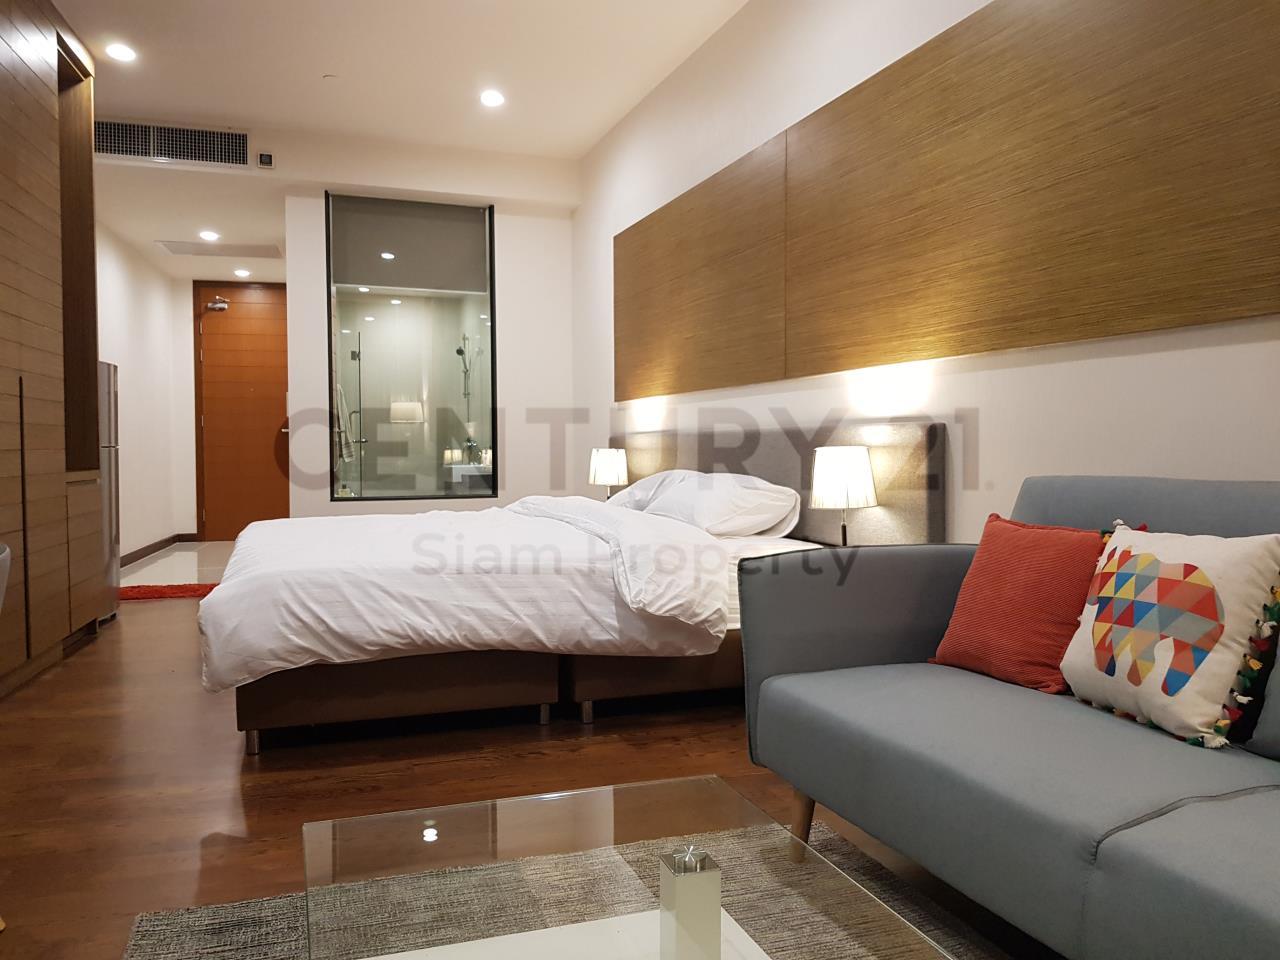 Century21 Siam Property Agency's Movenpick Residence Pattaya 3